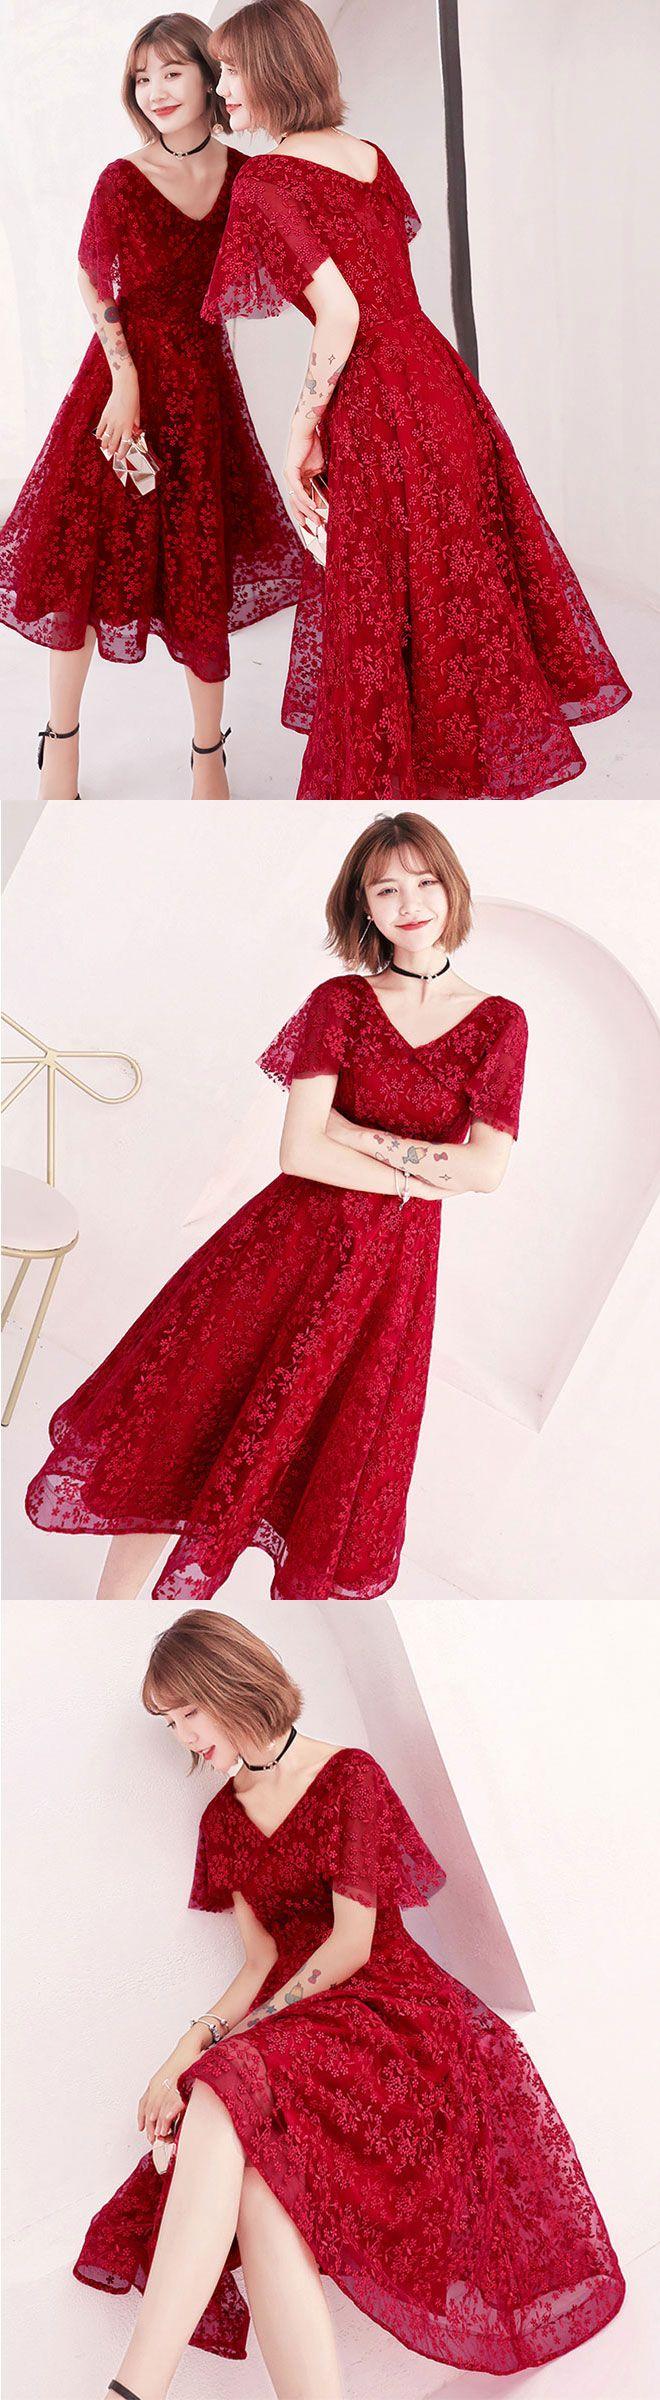 Cute lace short prom dress lace evening dress short prom dress